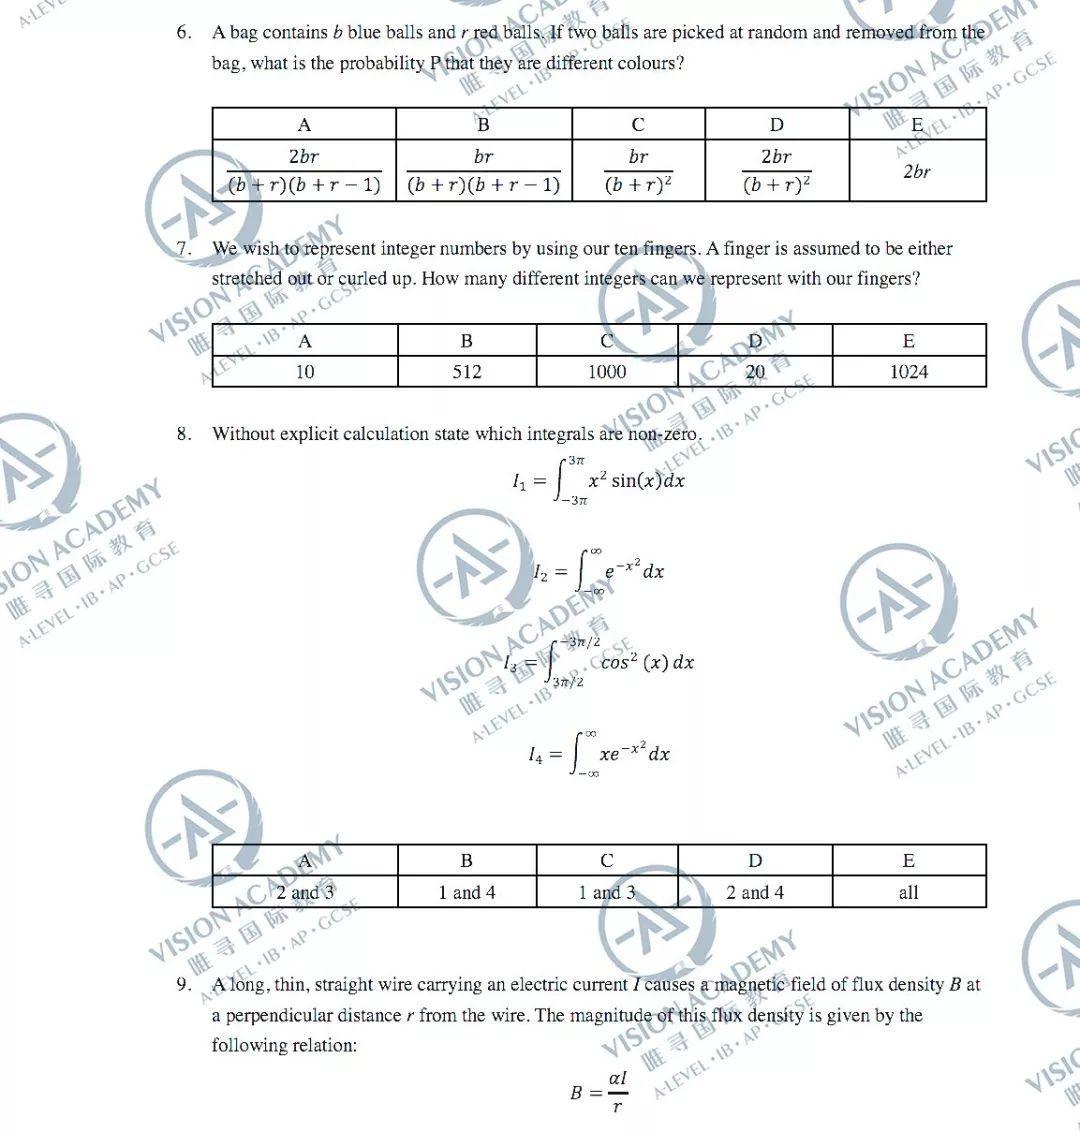 PAT2019最全真题+天团解析+考情分析来了! 自评快看  牛津大学 考试 竞赛 第4张